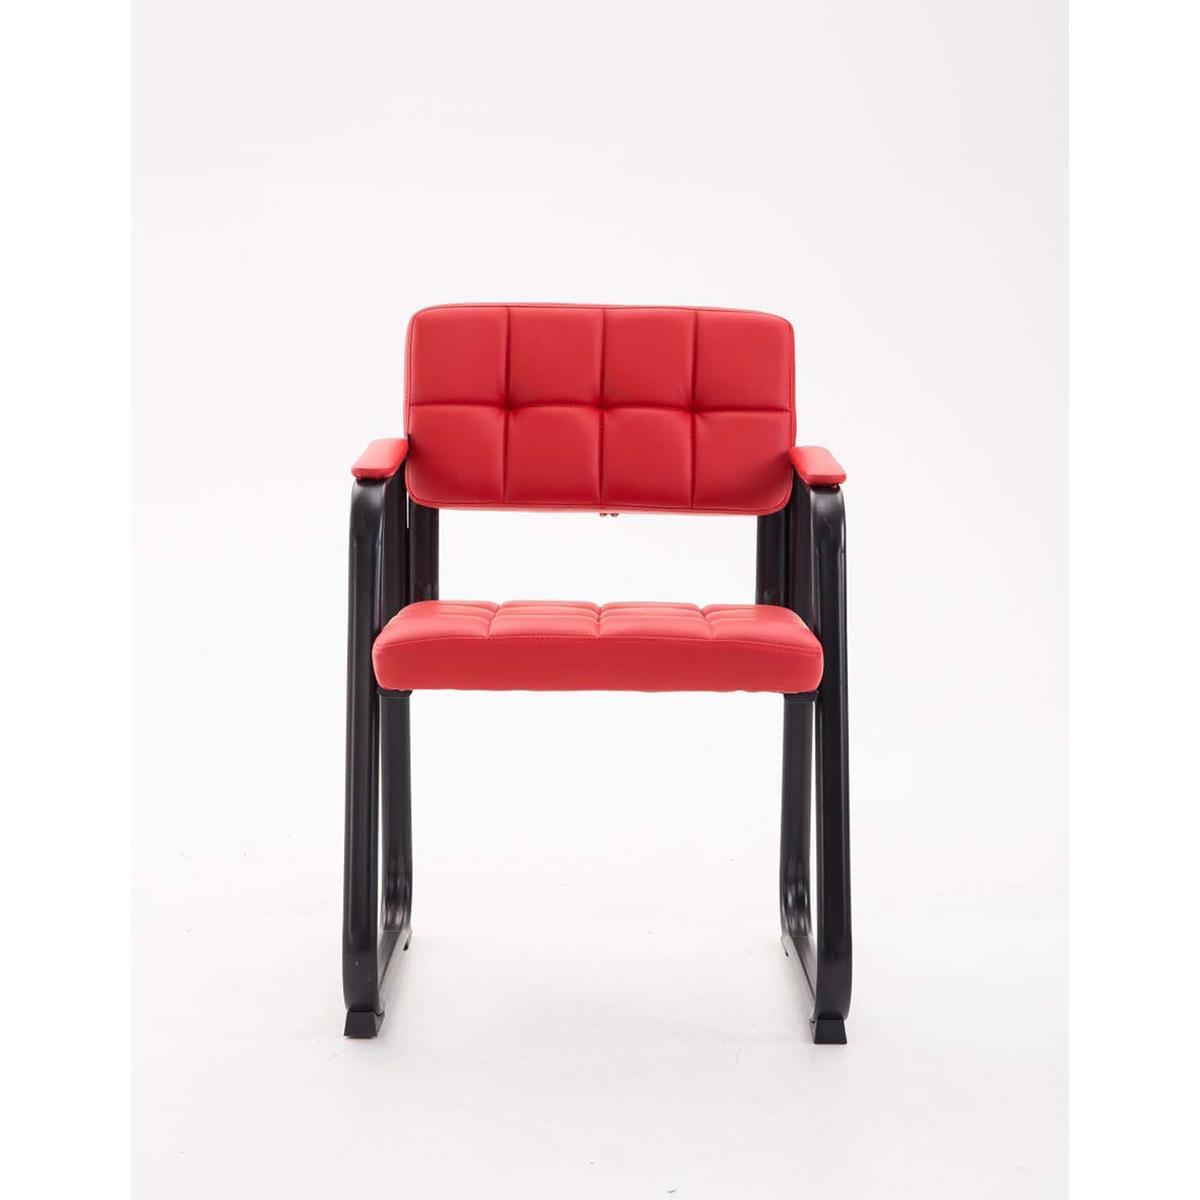 Chaise visiteur CABANA, Design Moderne, Structure ...